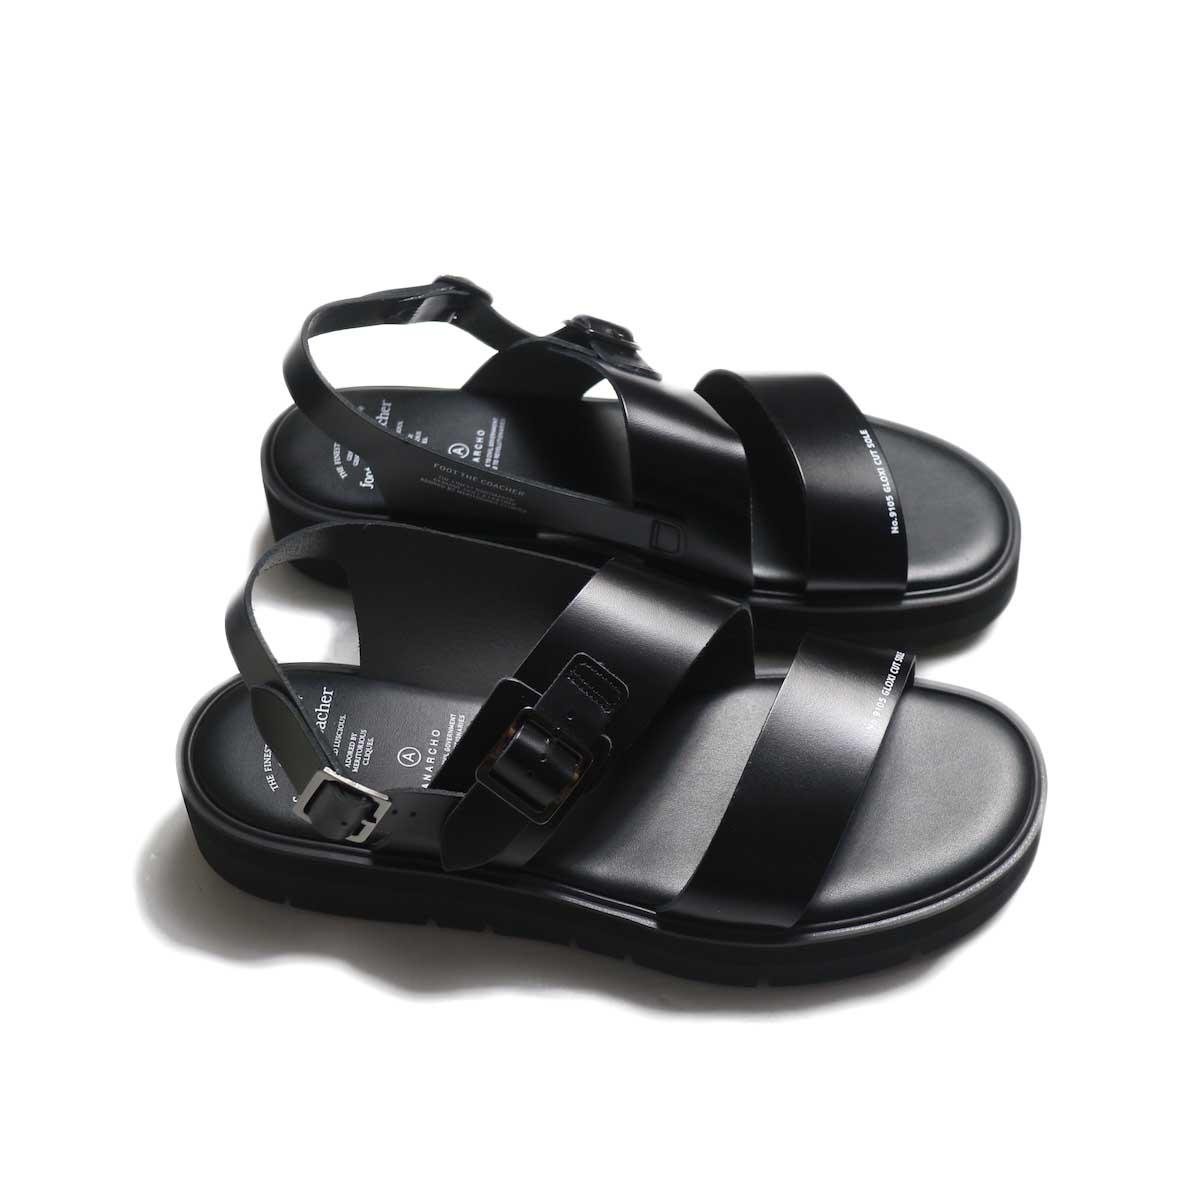 foot the coacher / SS BELT SANDALS (GLOXI CUT SOLE) -Black 横